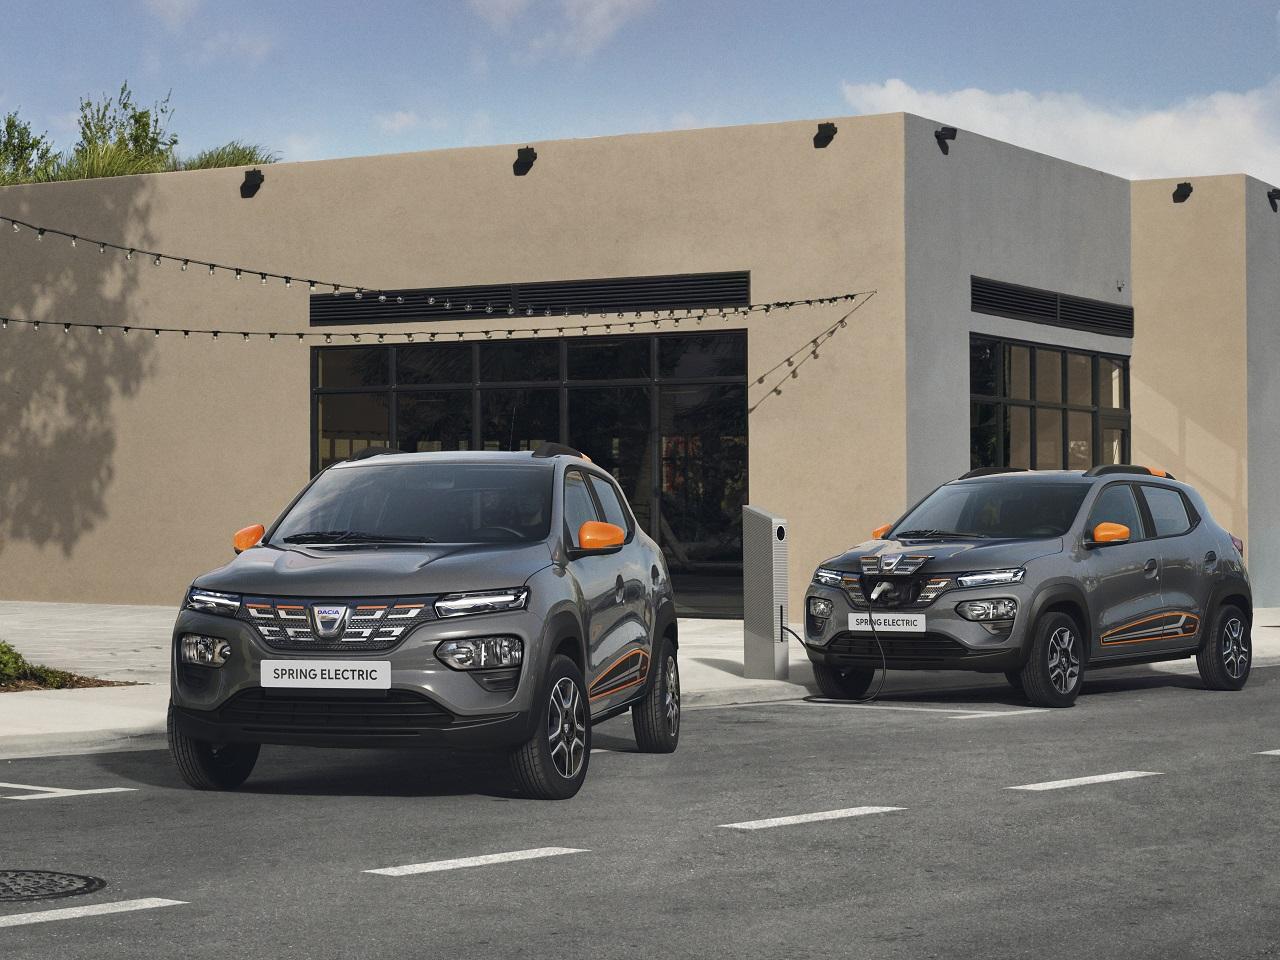 Renault Twingo Electric 2020 Dacia Spring